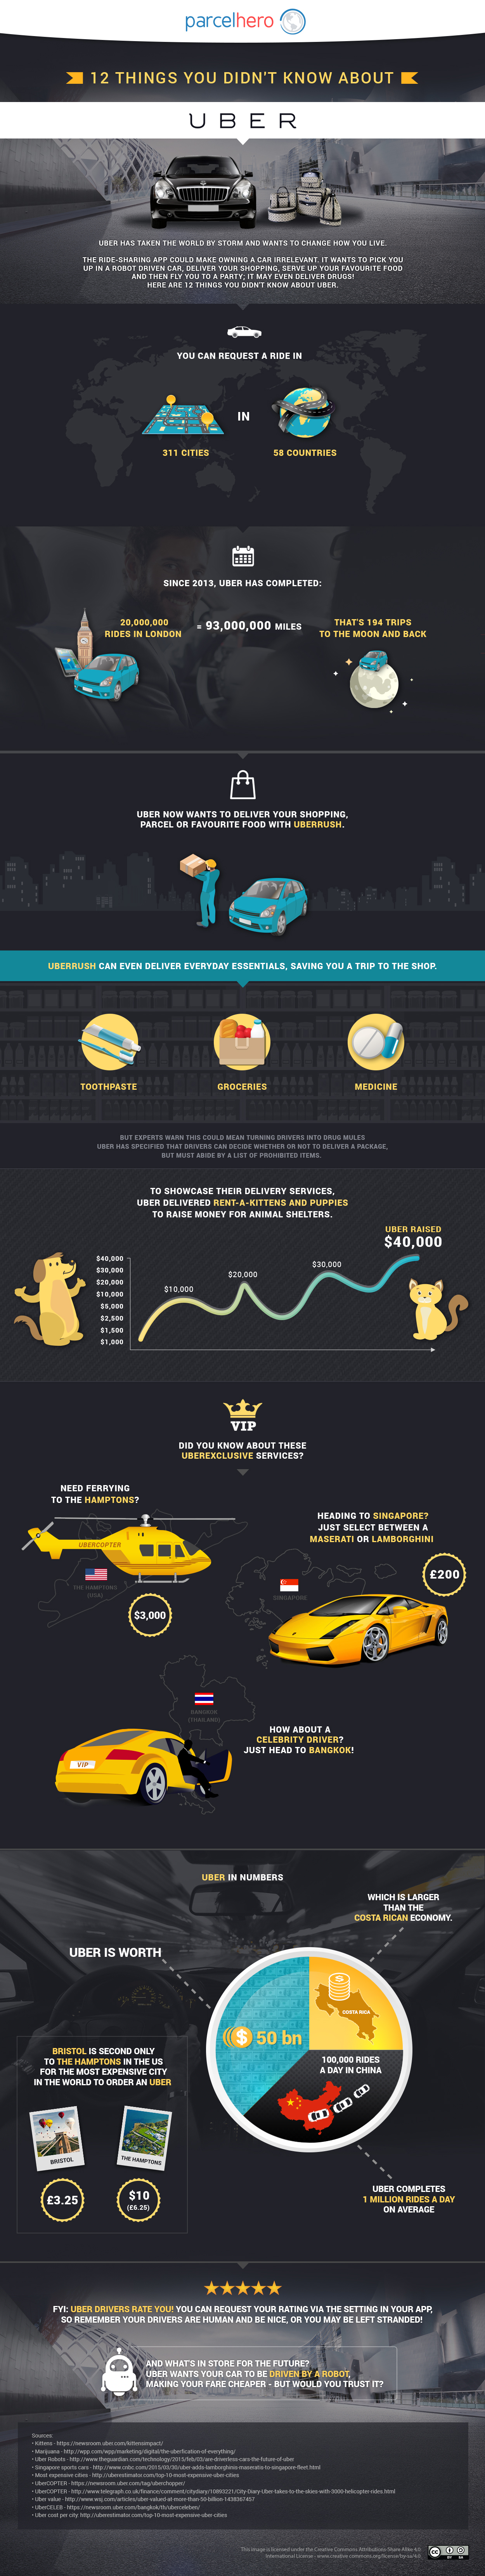 UBER_infographic-3